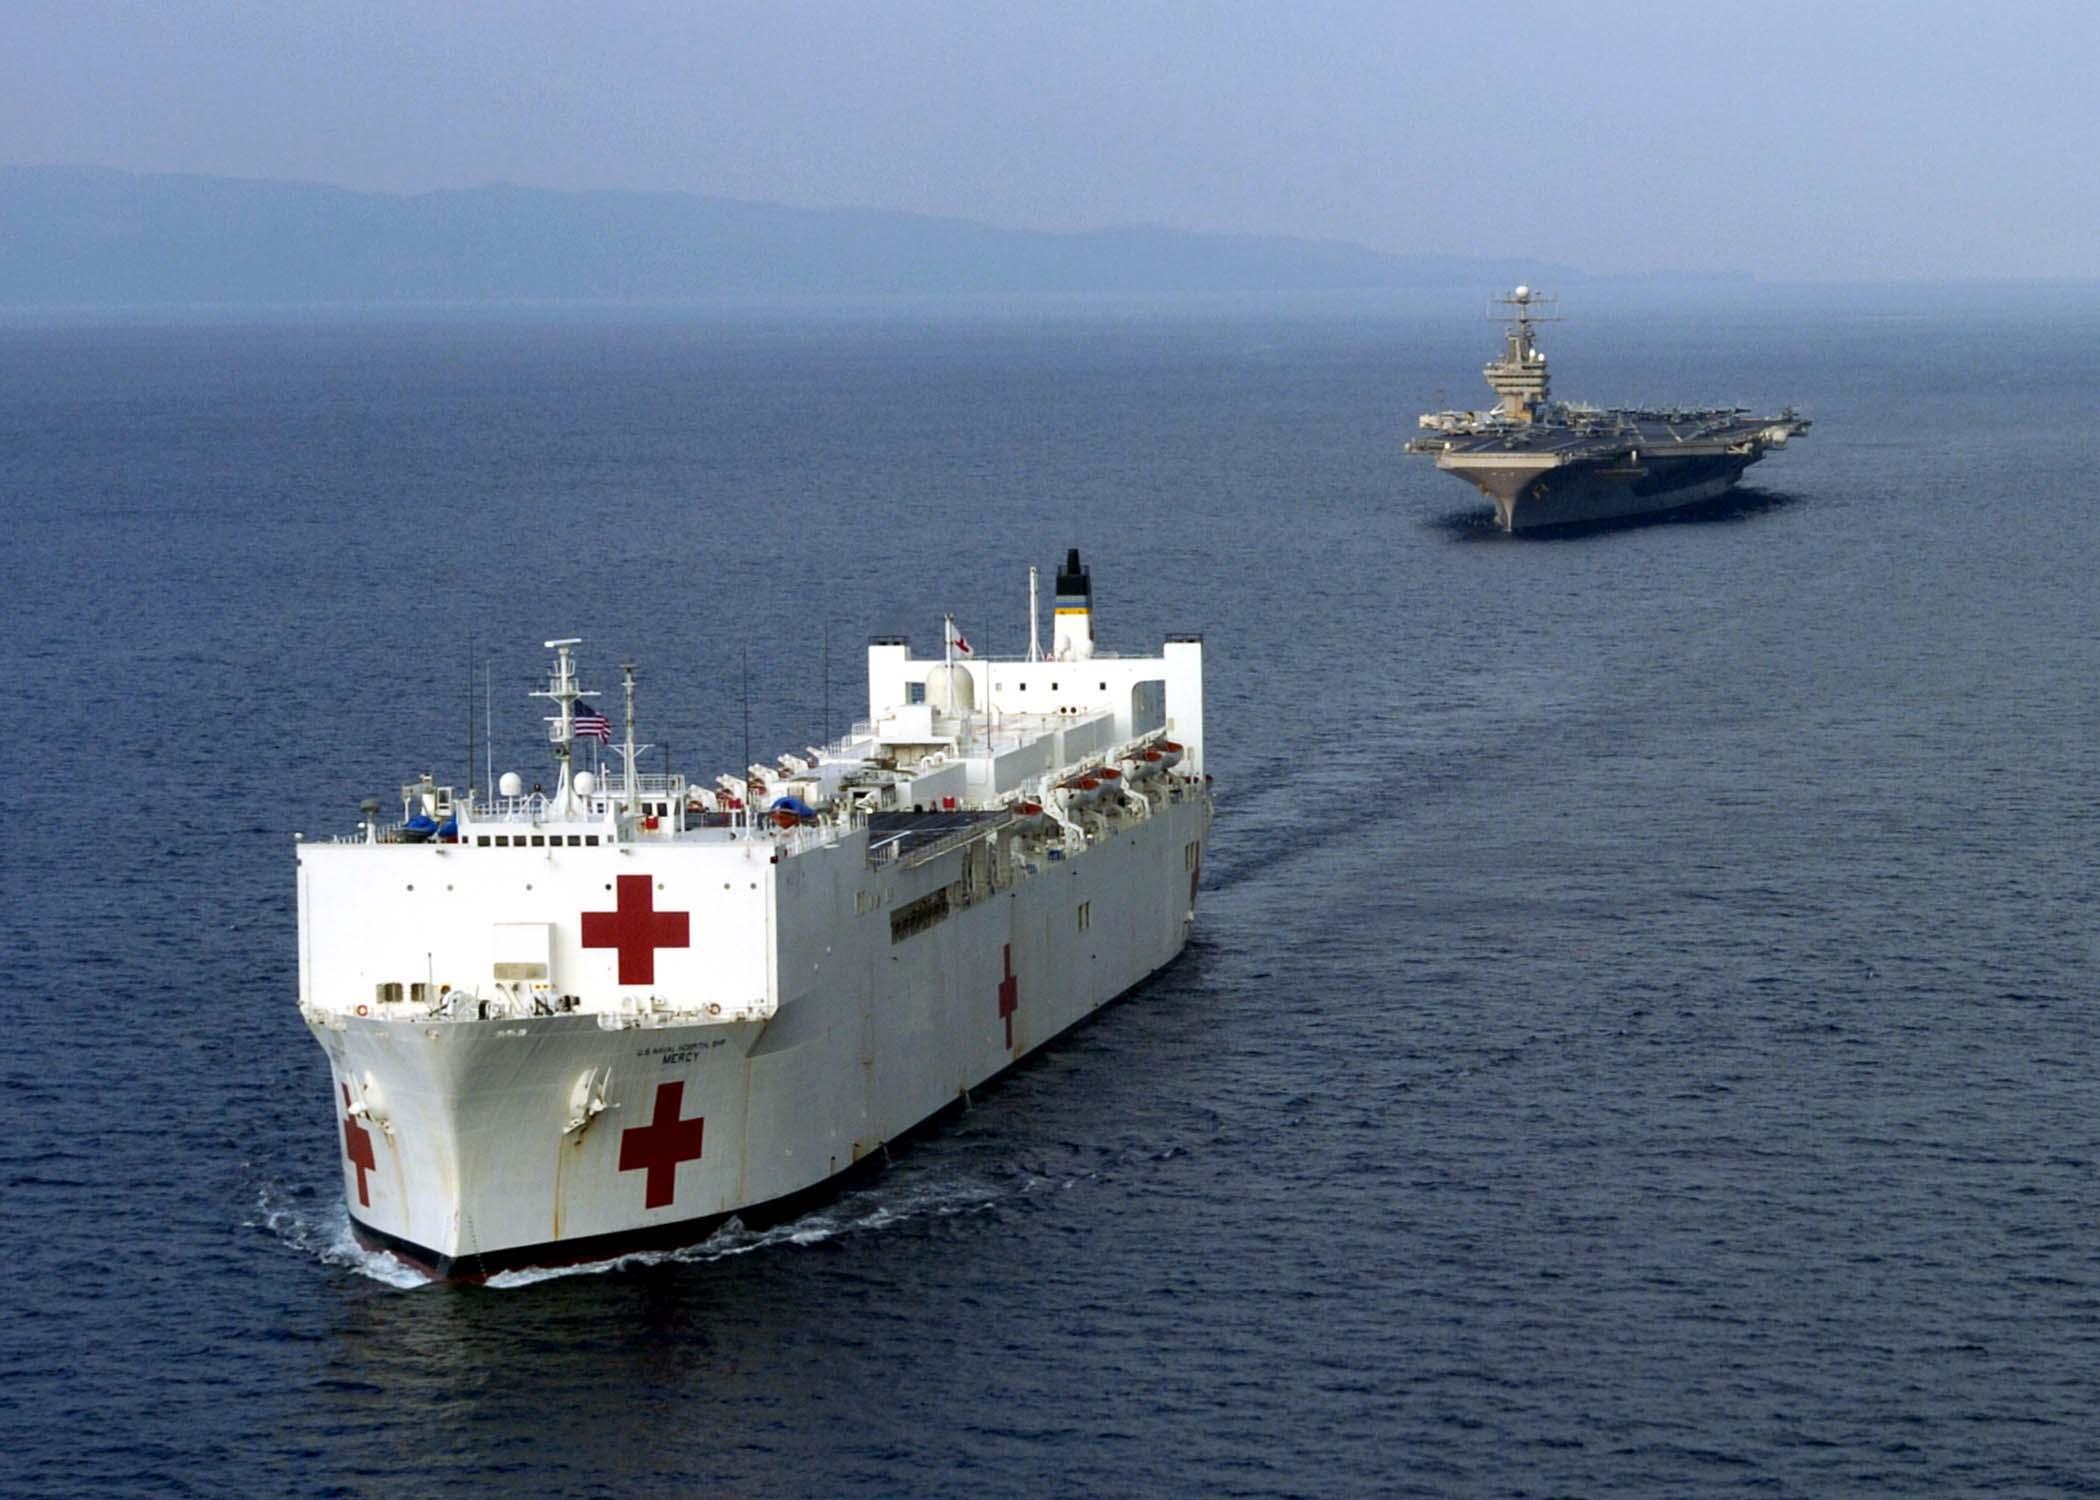 https://upload.wikimedia.org/wikipedia/commons/9/98/US_Navy_050203-N-6020P-137_The_Military_Sealift_Command_%28MSC%29_hospital_ship_USNS_Mercy_%28T-AH_19%29_navigates_alongside_USS_Abraham_Lincoln_%28CVN_72%29_after_arriving_on_station_near_Banda_Aceh%2C_Sumatra%2C_Indonesia.jpg